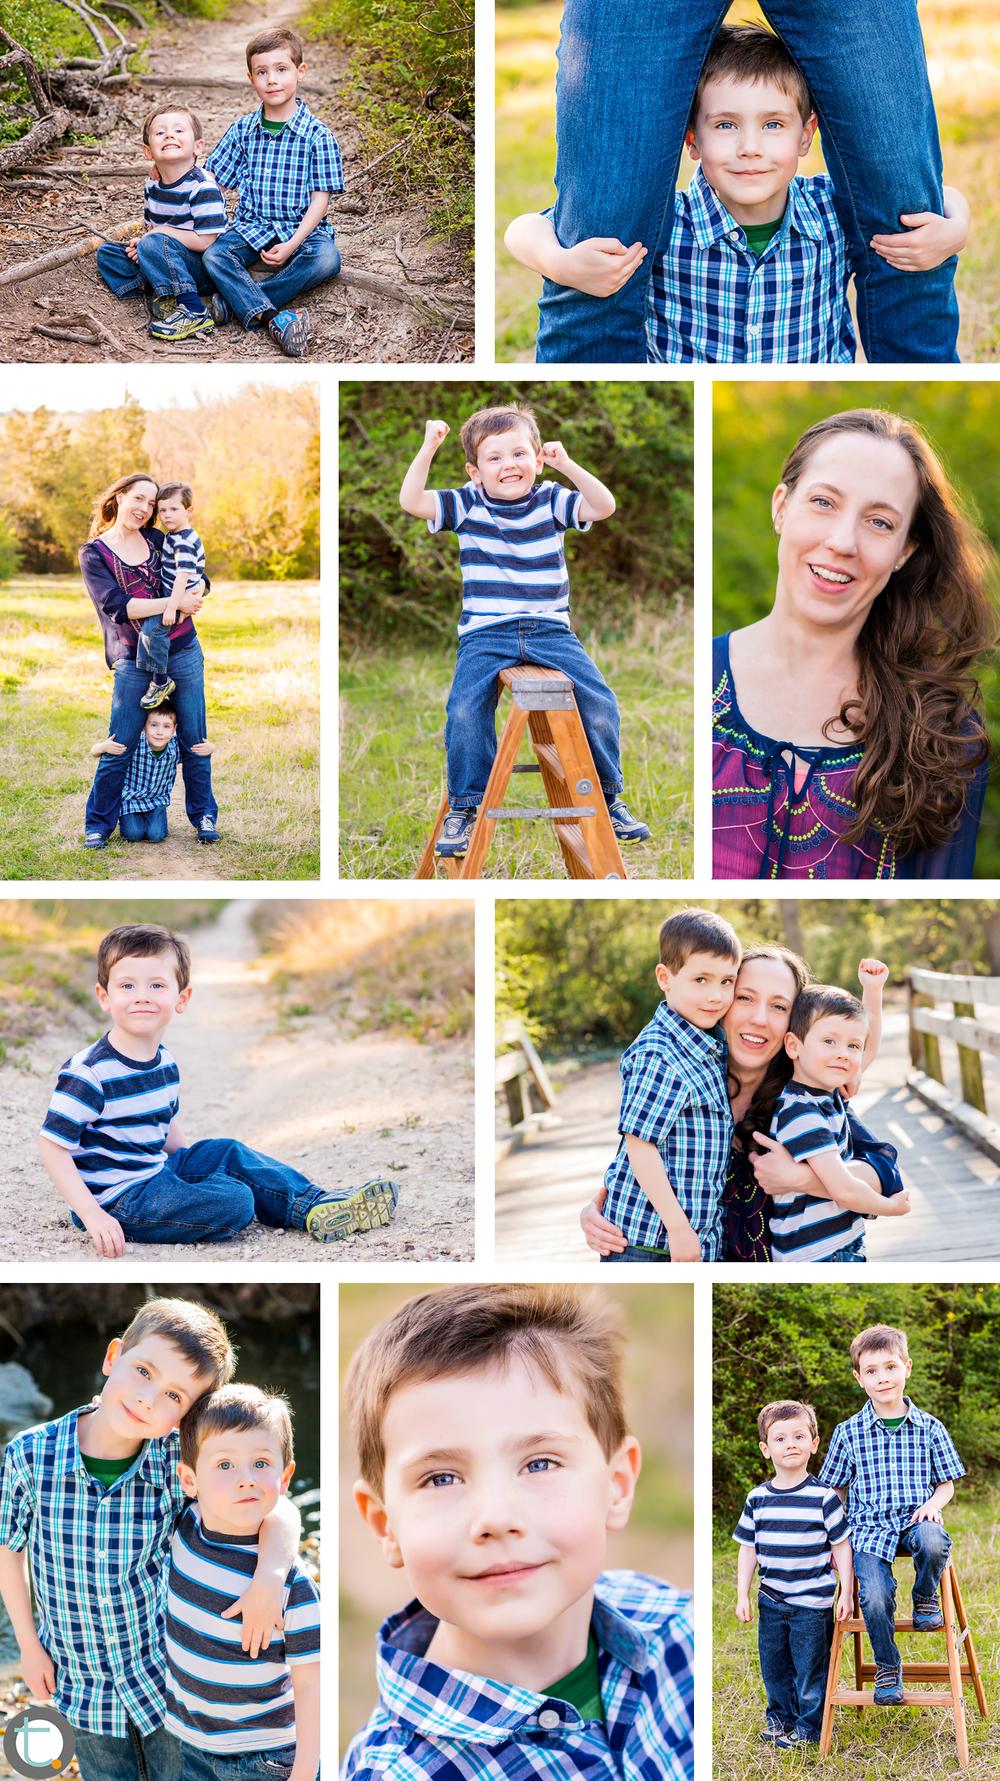 boys_mom_field_dallas_mindy_three_tracyallynphotography_families